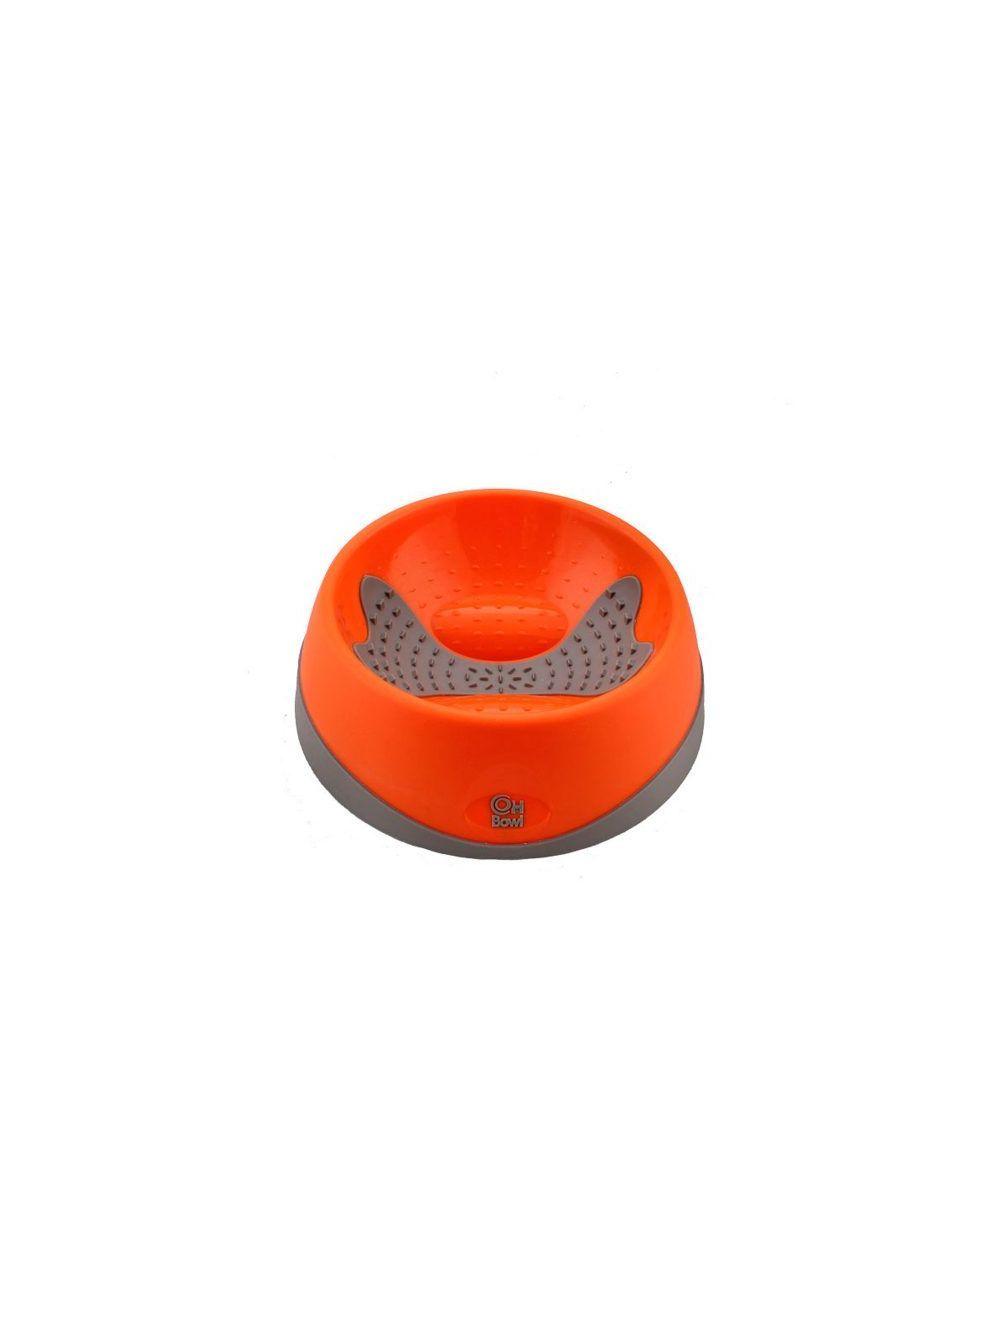 Hyper pet OHBowl naranja mediano